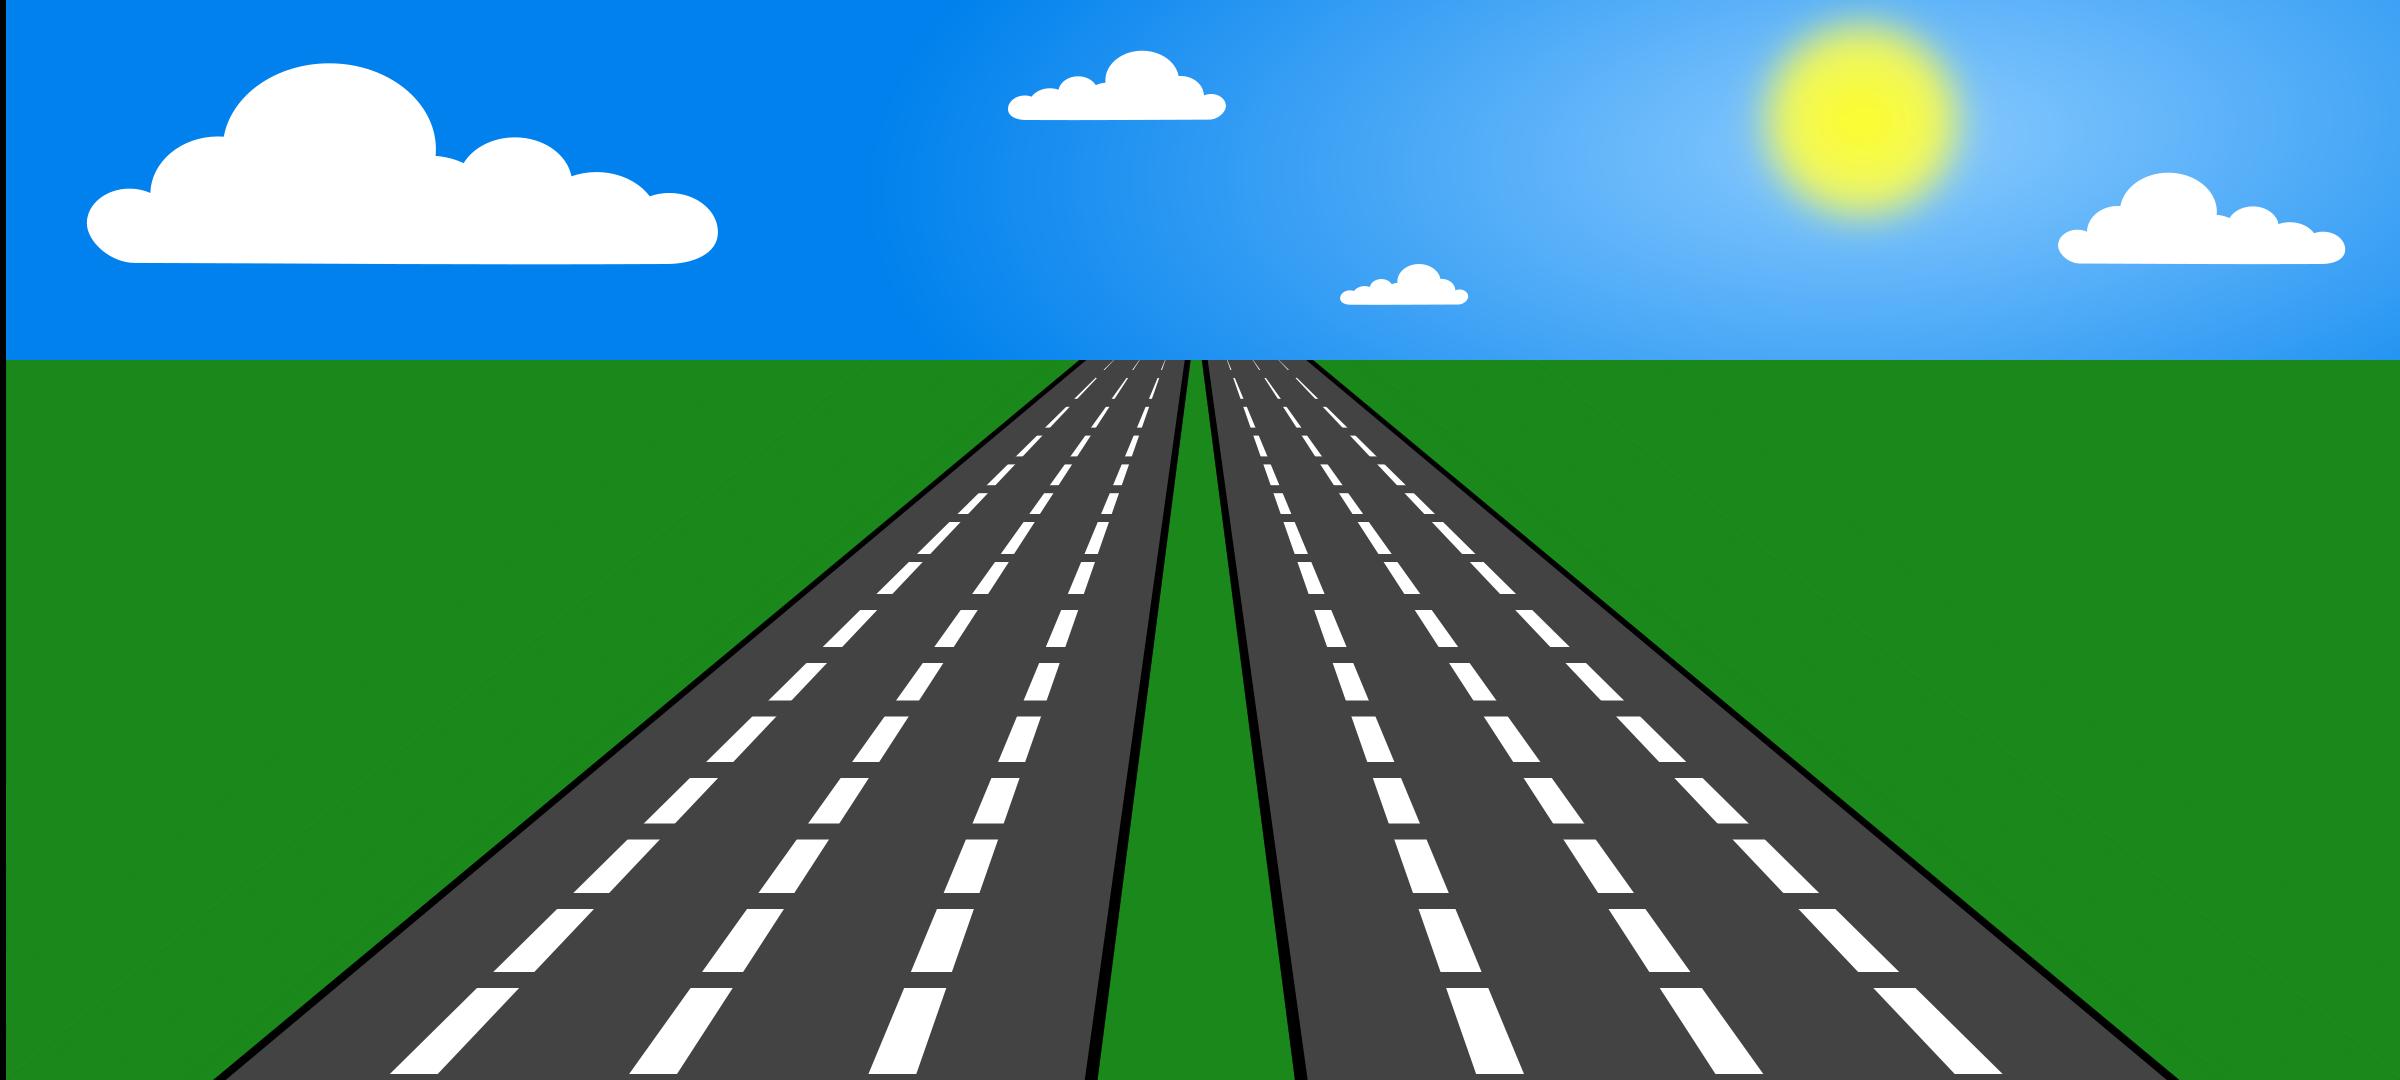 IncessantBlabber-Open-road.png